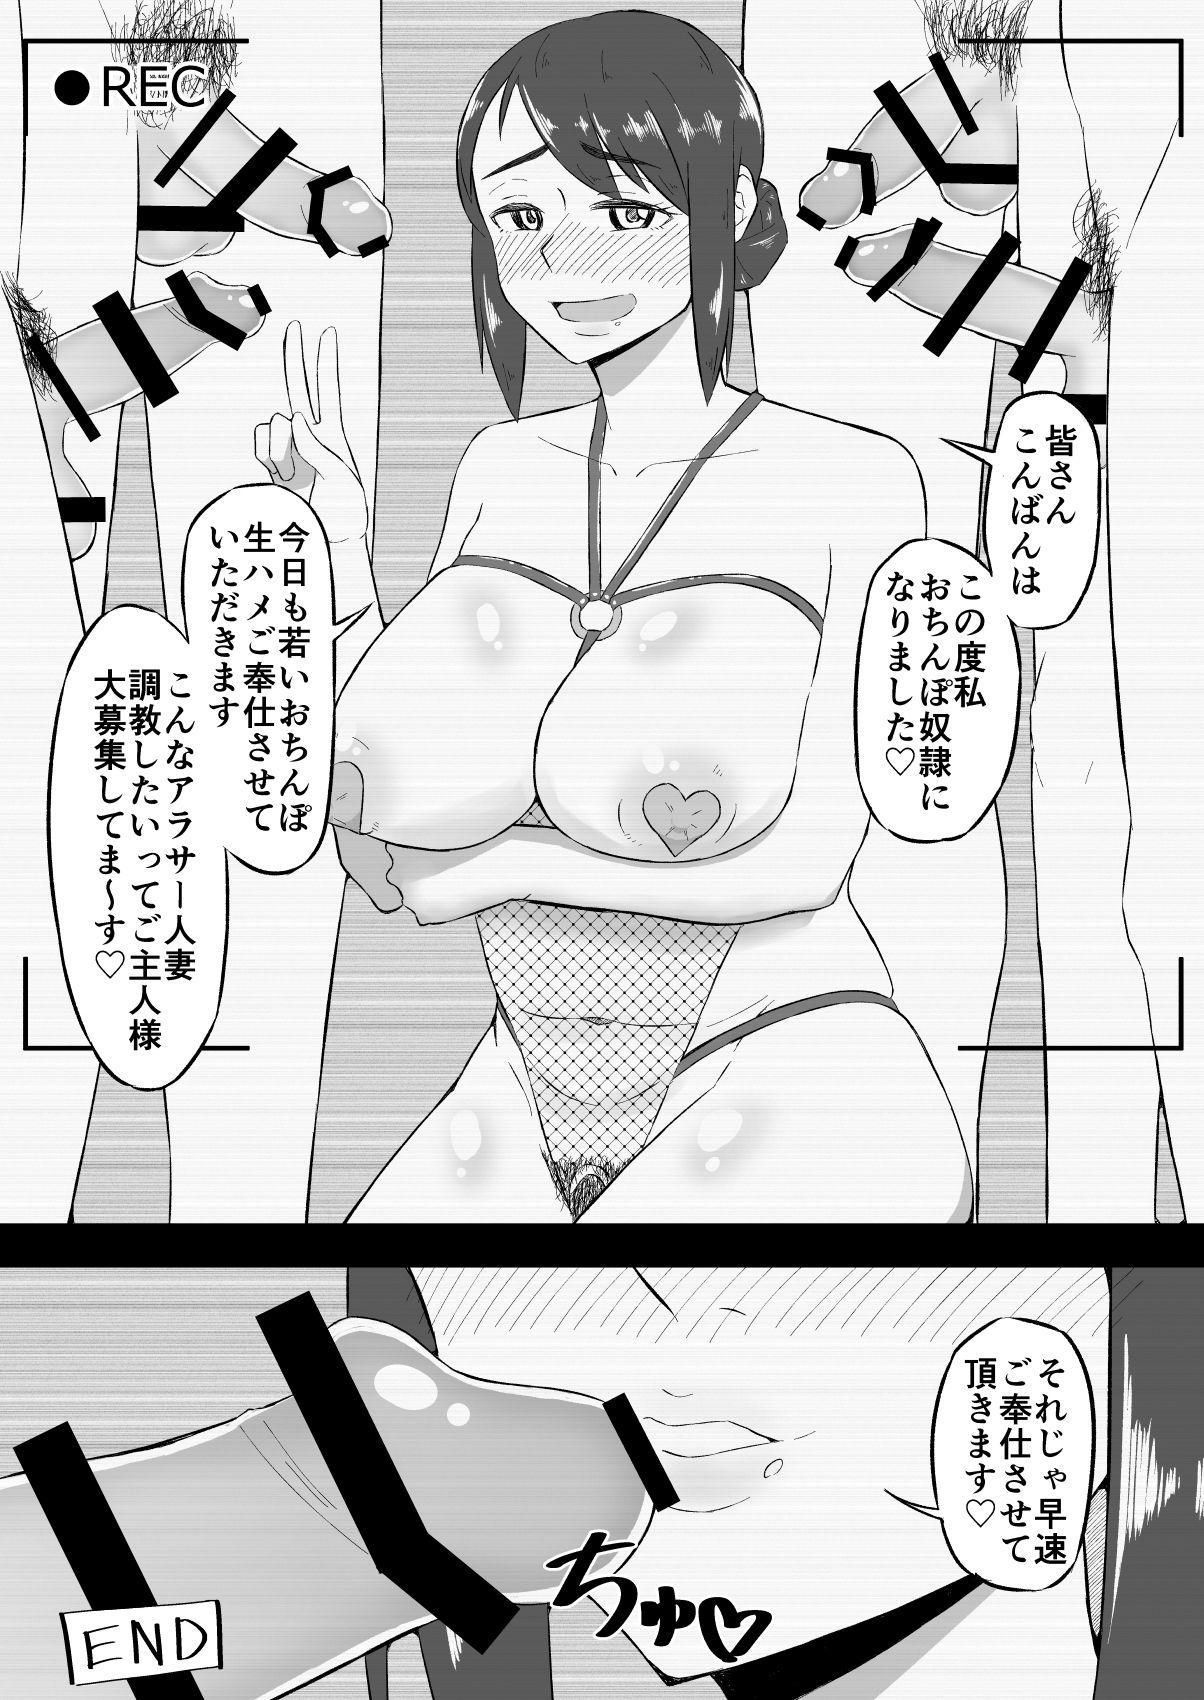 Hitozuma ga Off-kai de Omochikaerare Hon 21